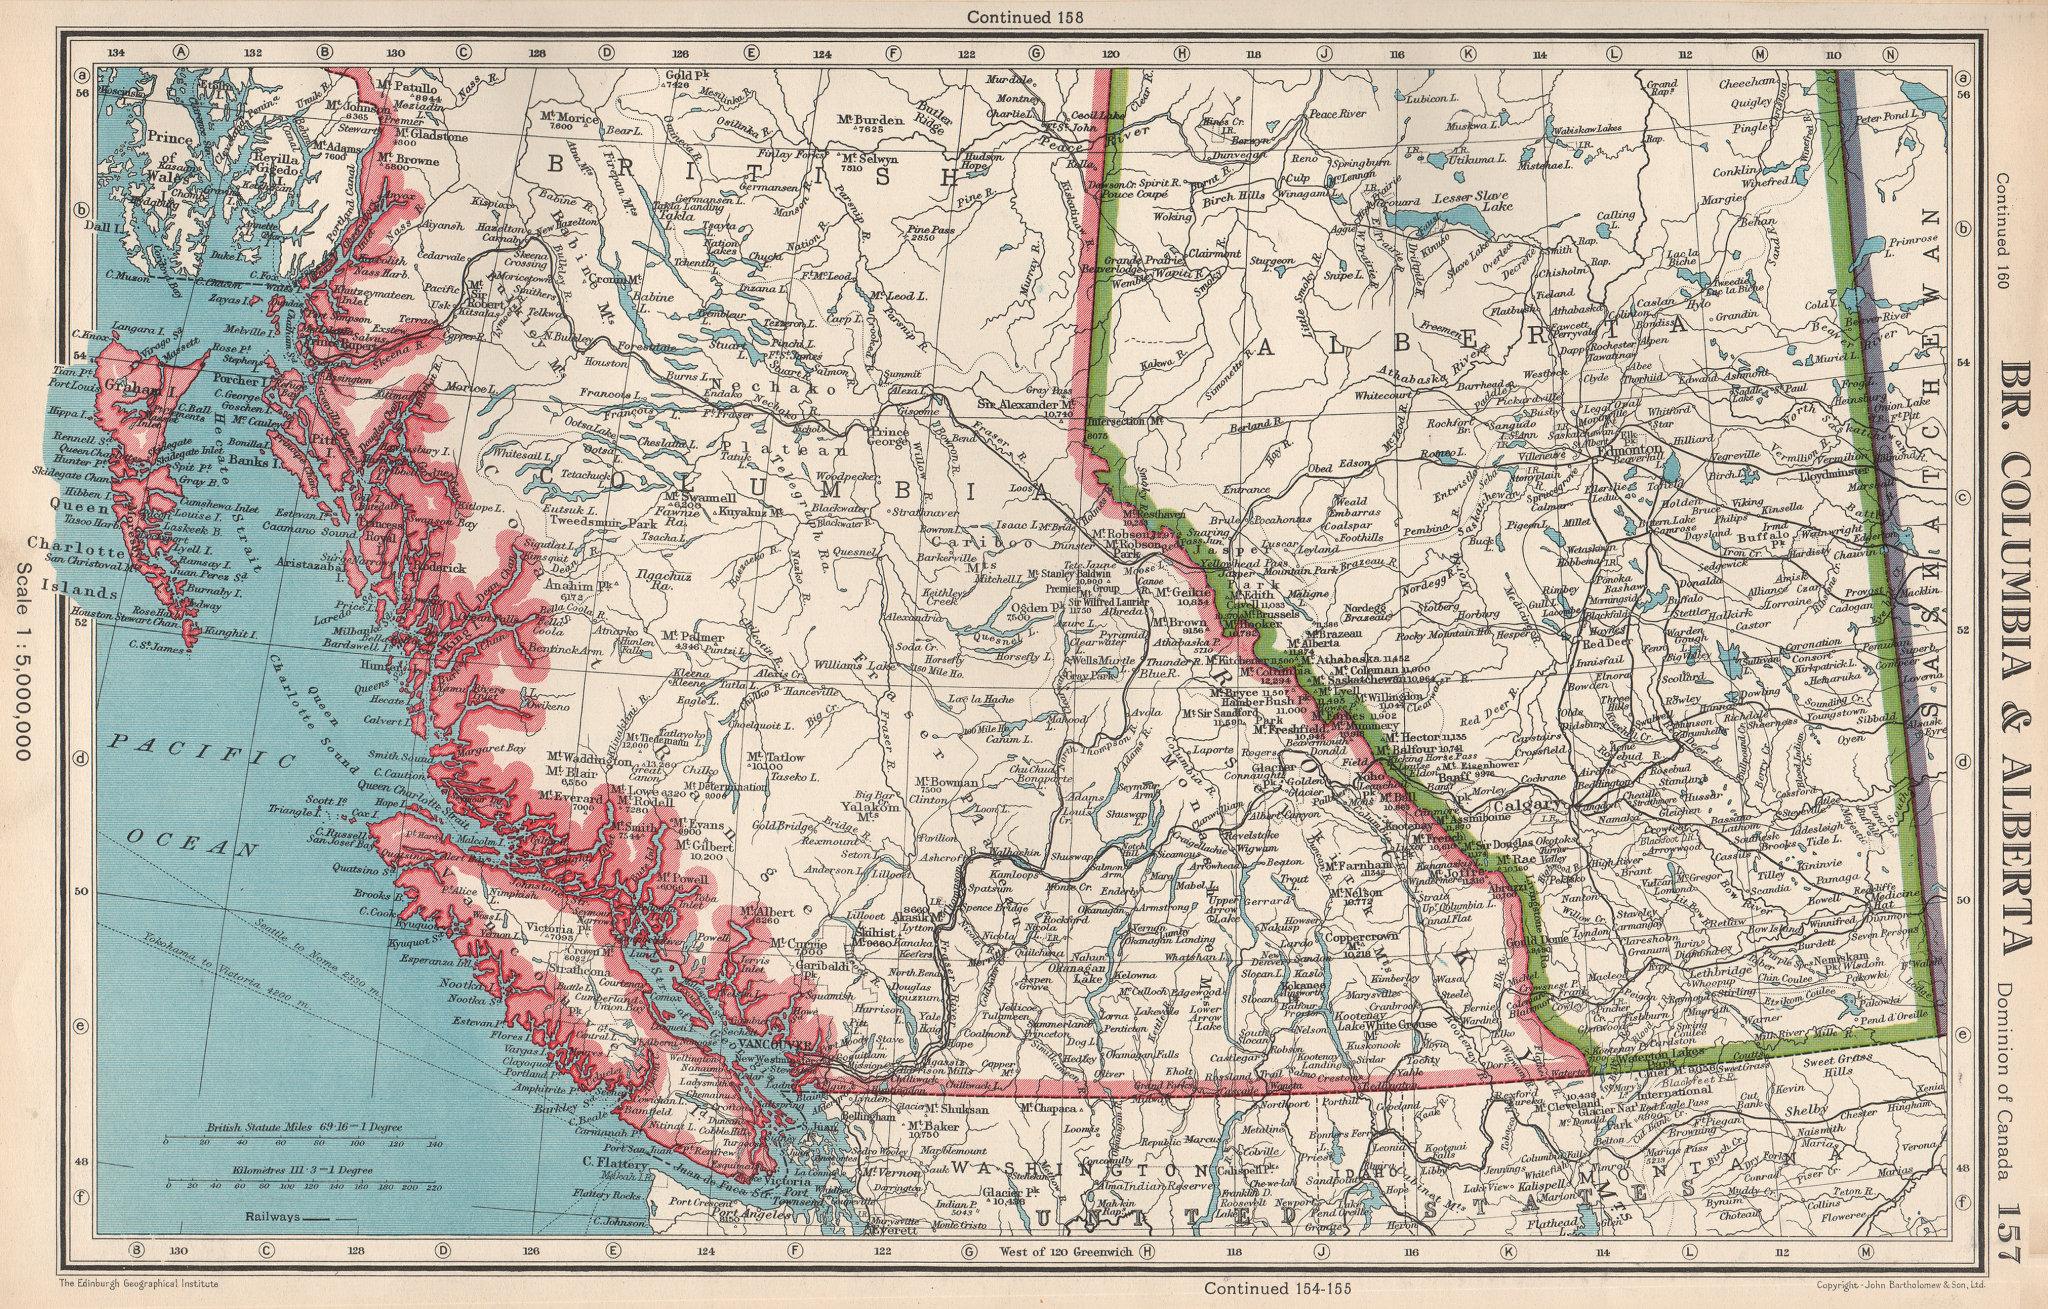 Associate Product CANADA. British Columbia & Alberta. Railways. BARTHOLOMEW 1952 old vintage map